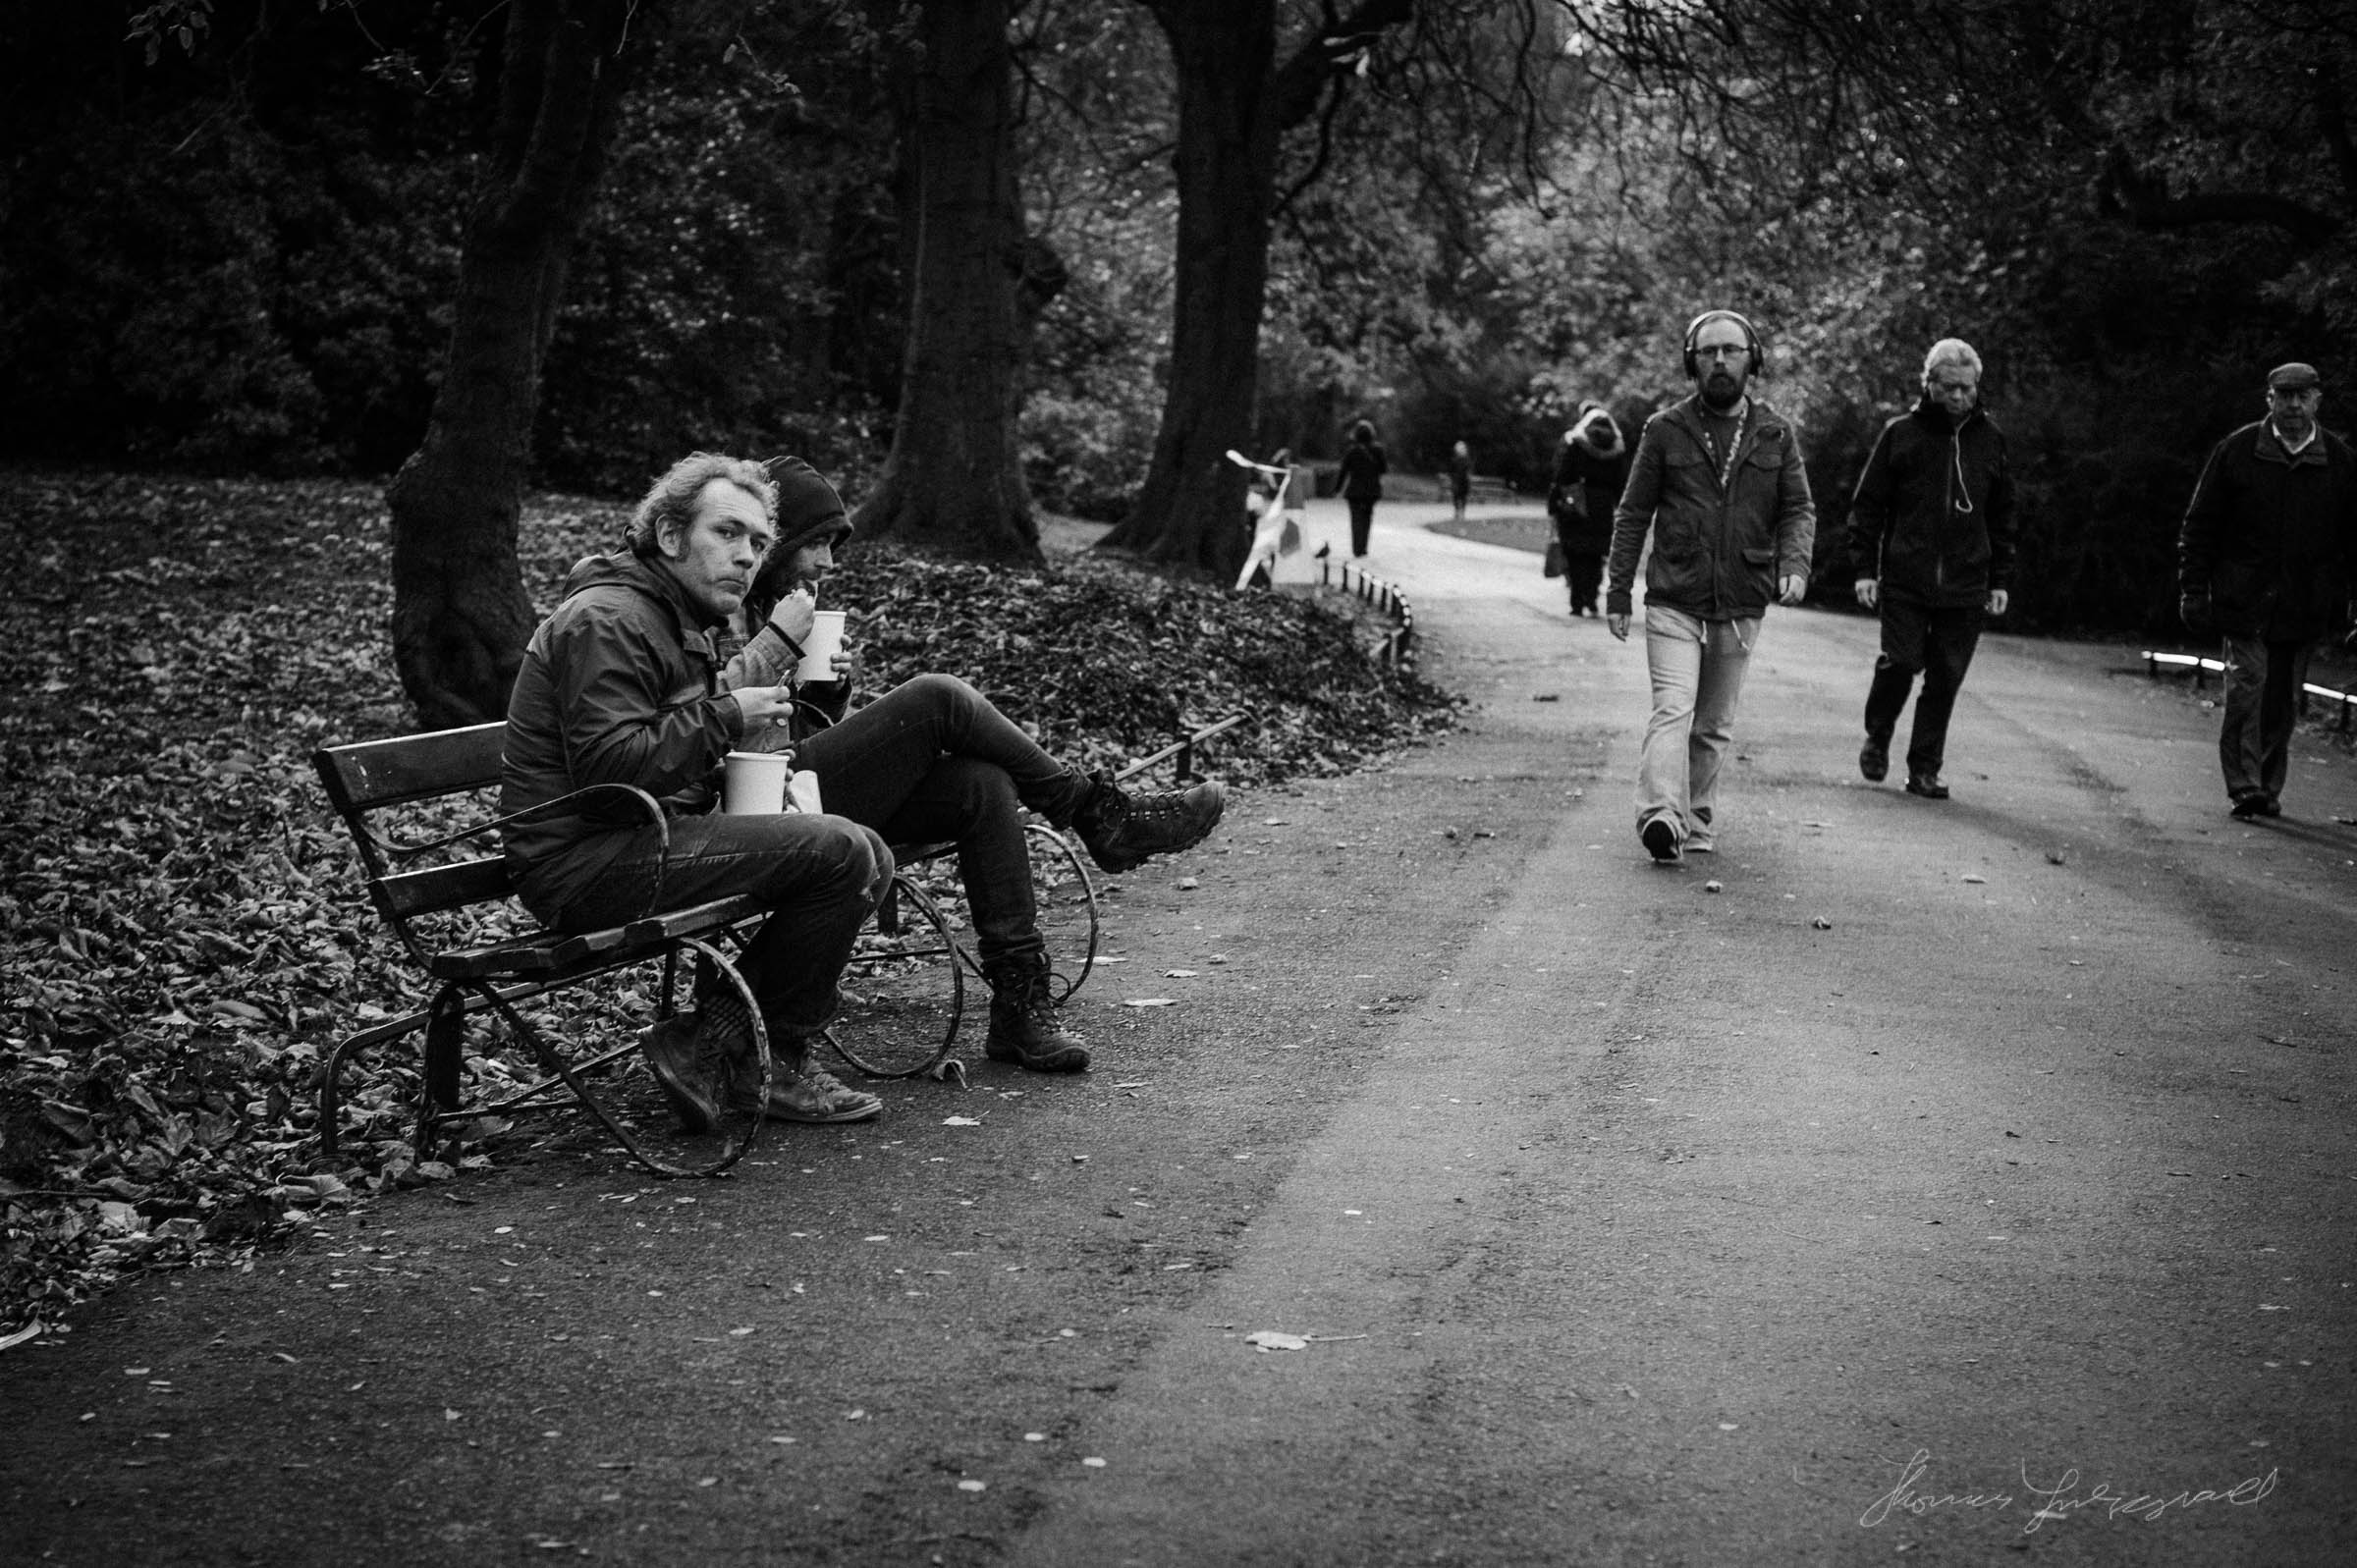 Street-photo-diary-eleven-53.jpg